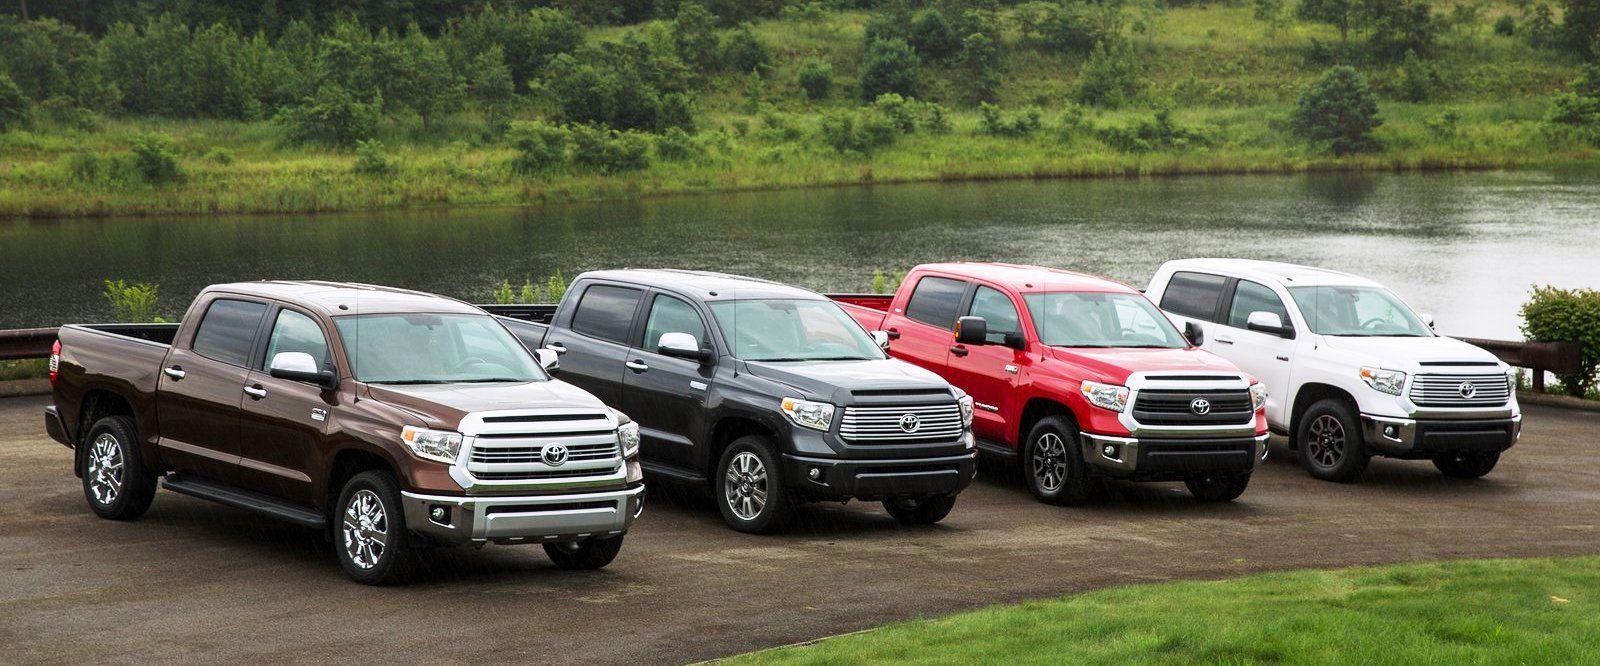 classic 2014 toyota tundra, Toyota tundra, Toyota